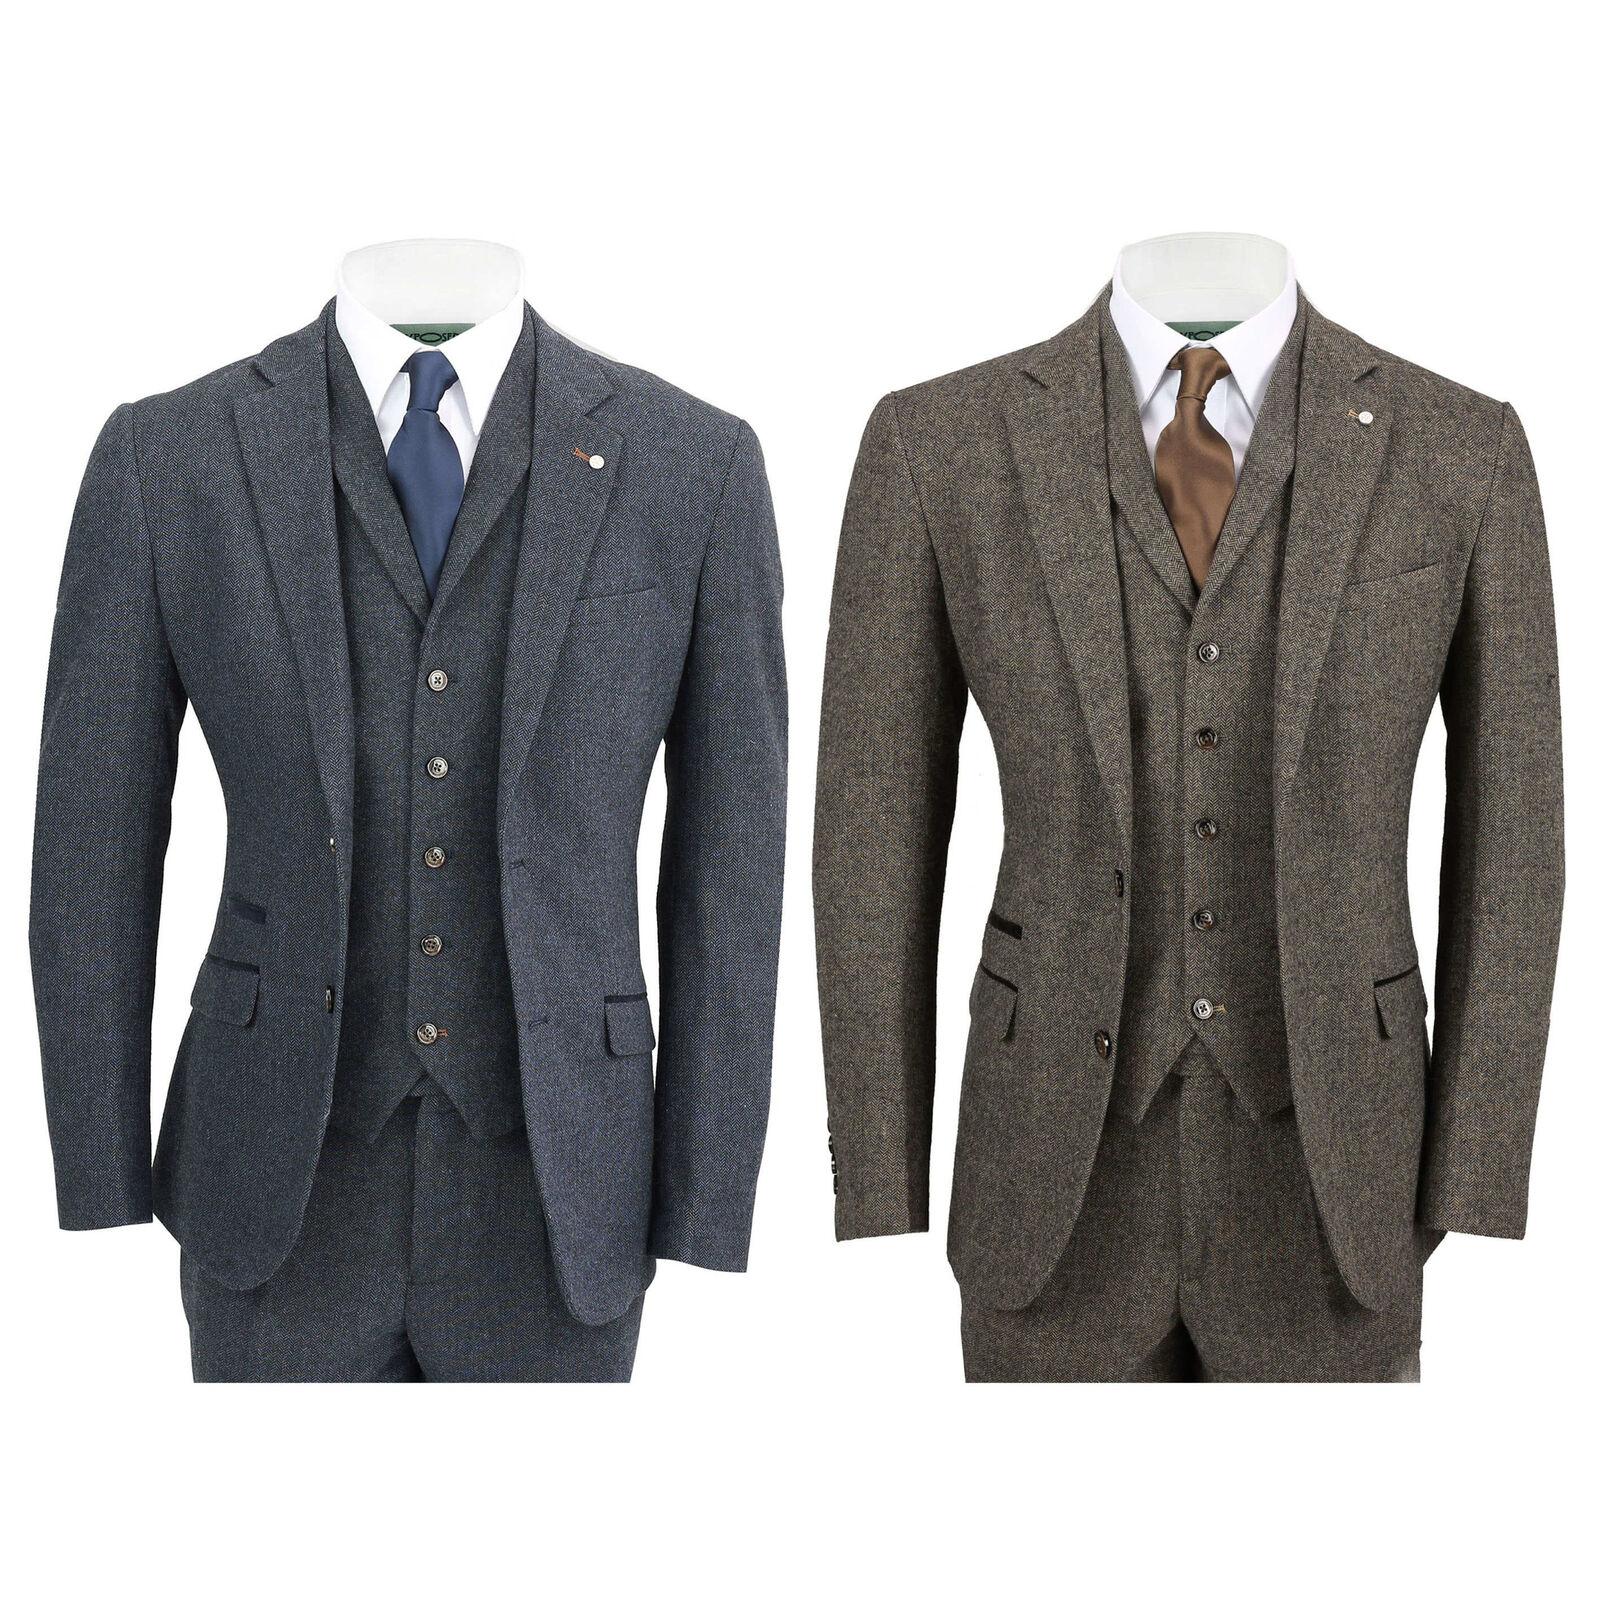 Herren Wool Mix 3 Piece Suit Vintage Herringbone Tweed TailoROT Fit in Braun, Navy